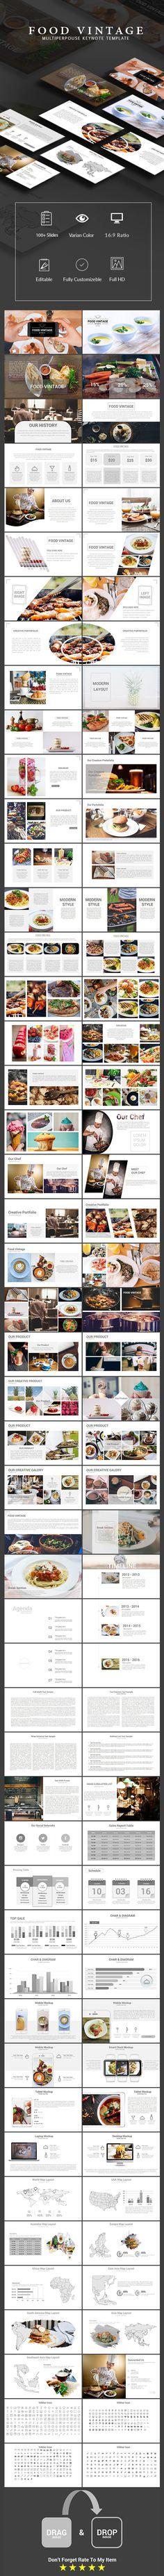 Food Vintage - Multiperpouse Keynote Template